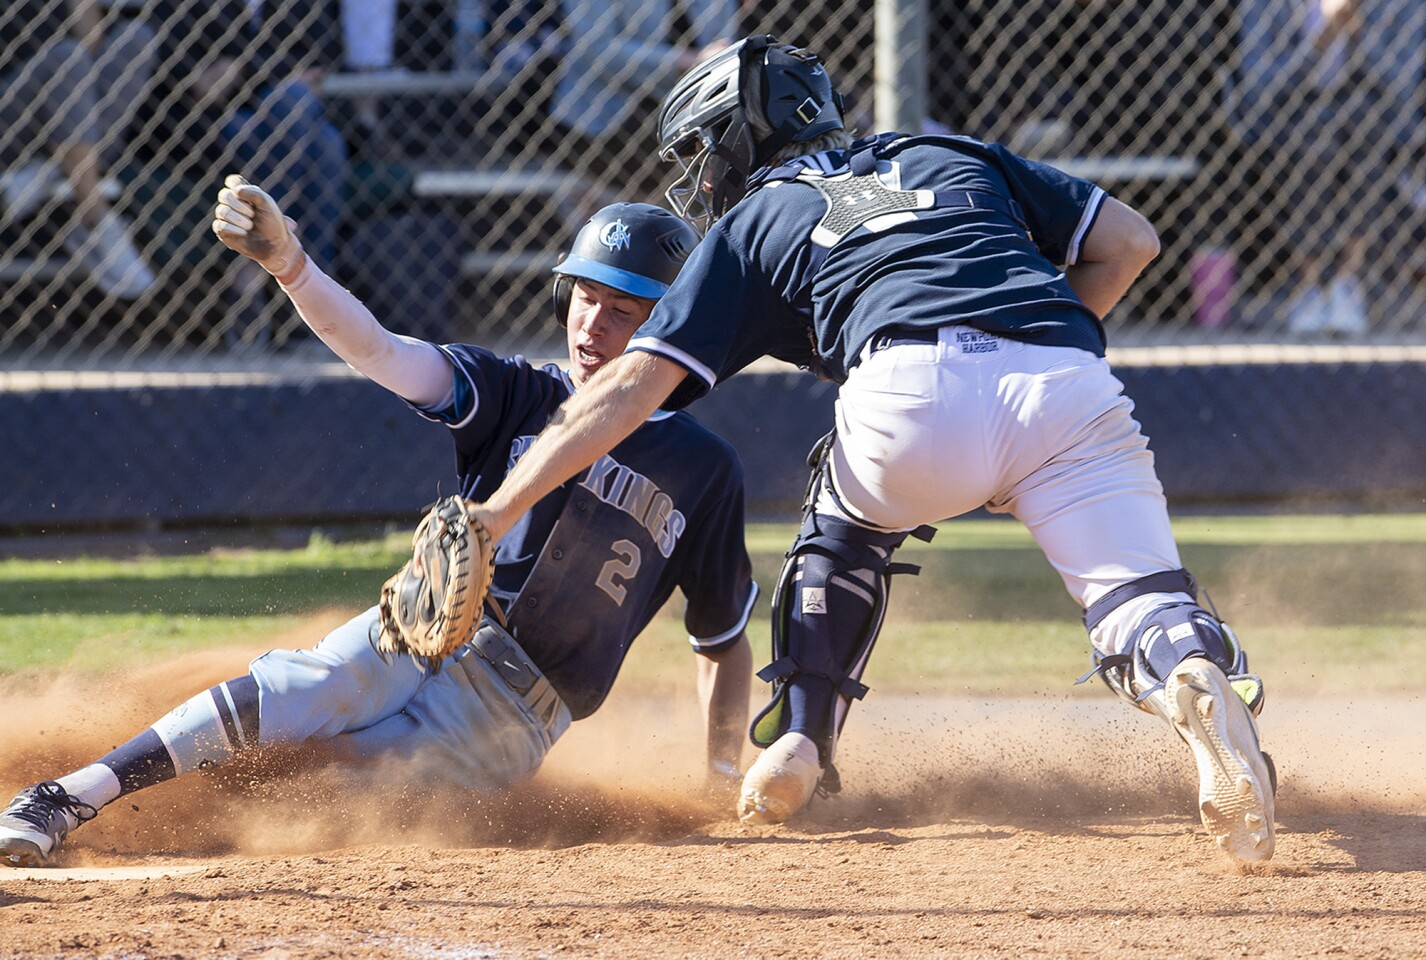 Photo Gallery: Newport Harbor vs. Corona del Mar in a boys' baseball game